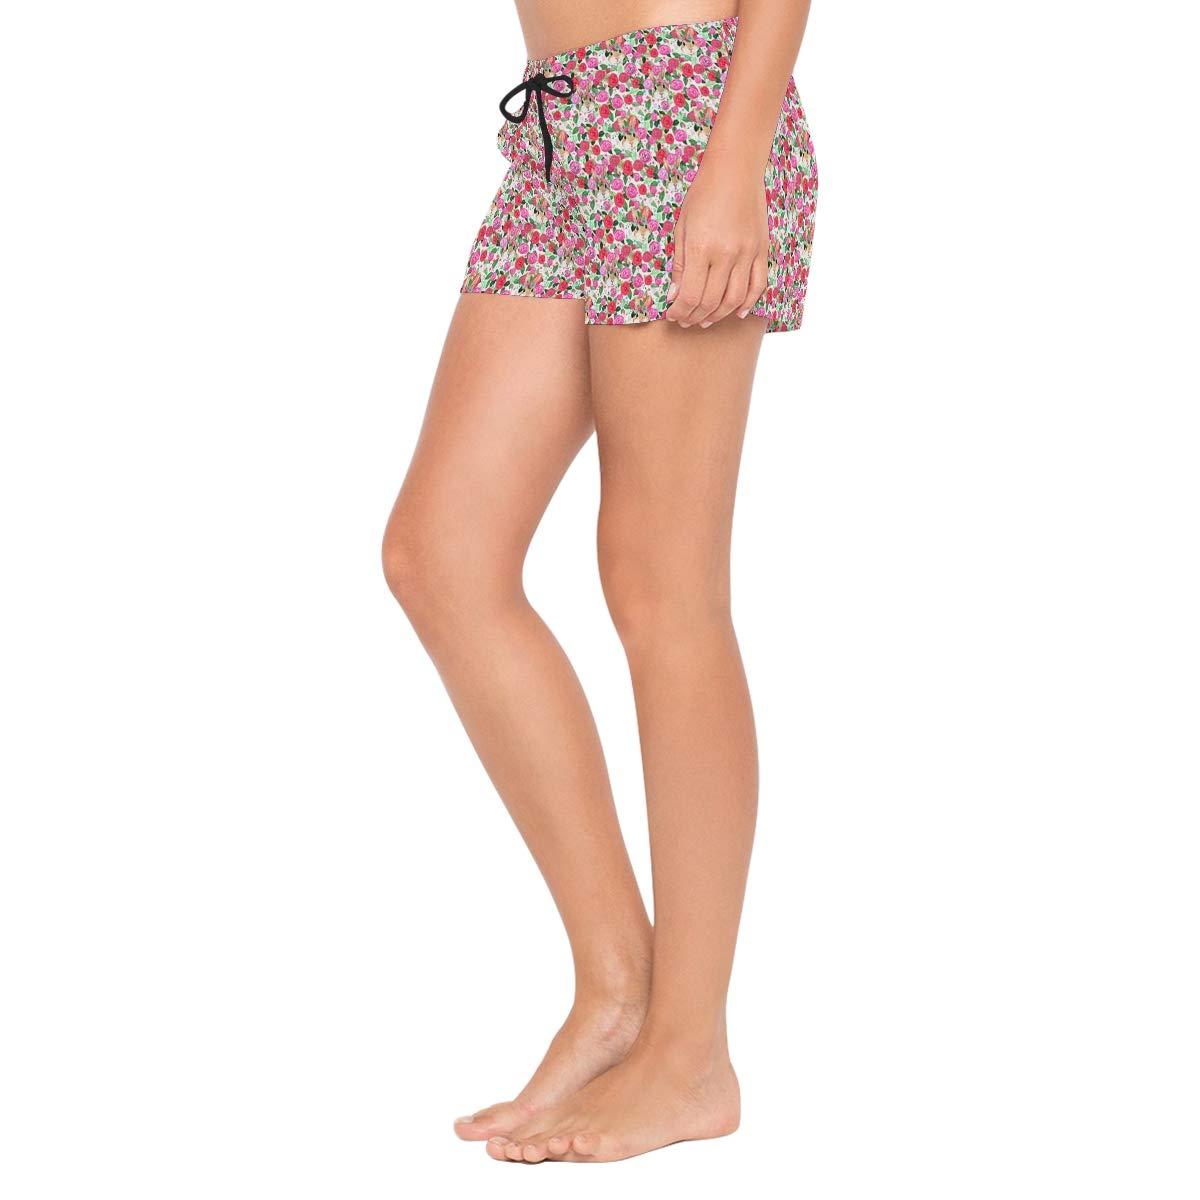 Lttedeng Womens Swim Trunks Summer 3D Print Bunny Blush Roses Casual Athletic Swimming Short